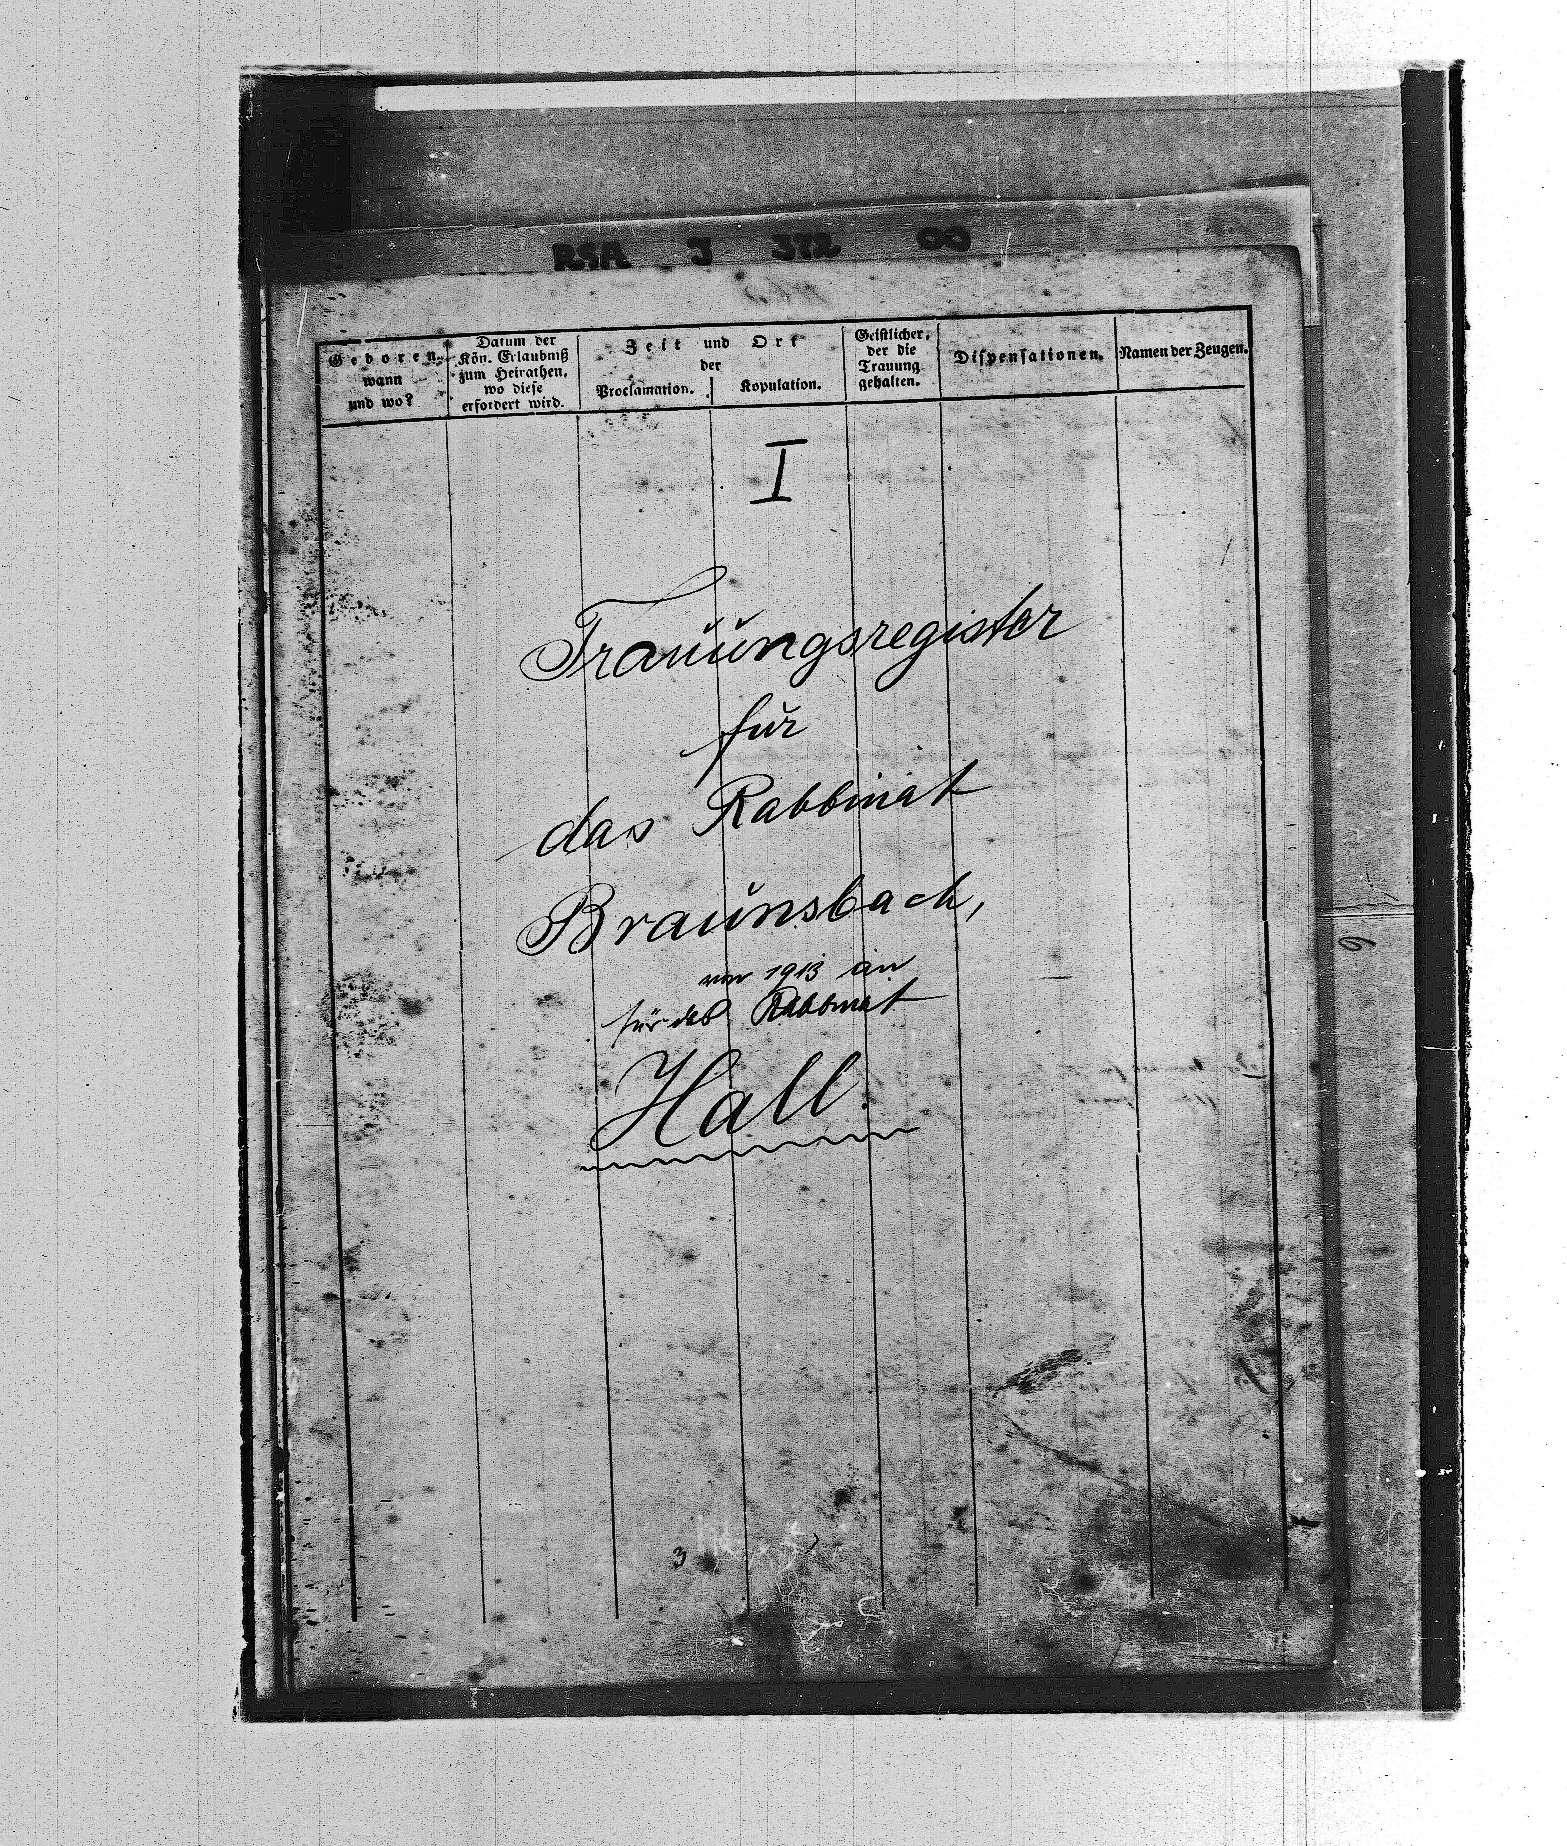 Braunsbach, Bild 1